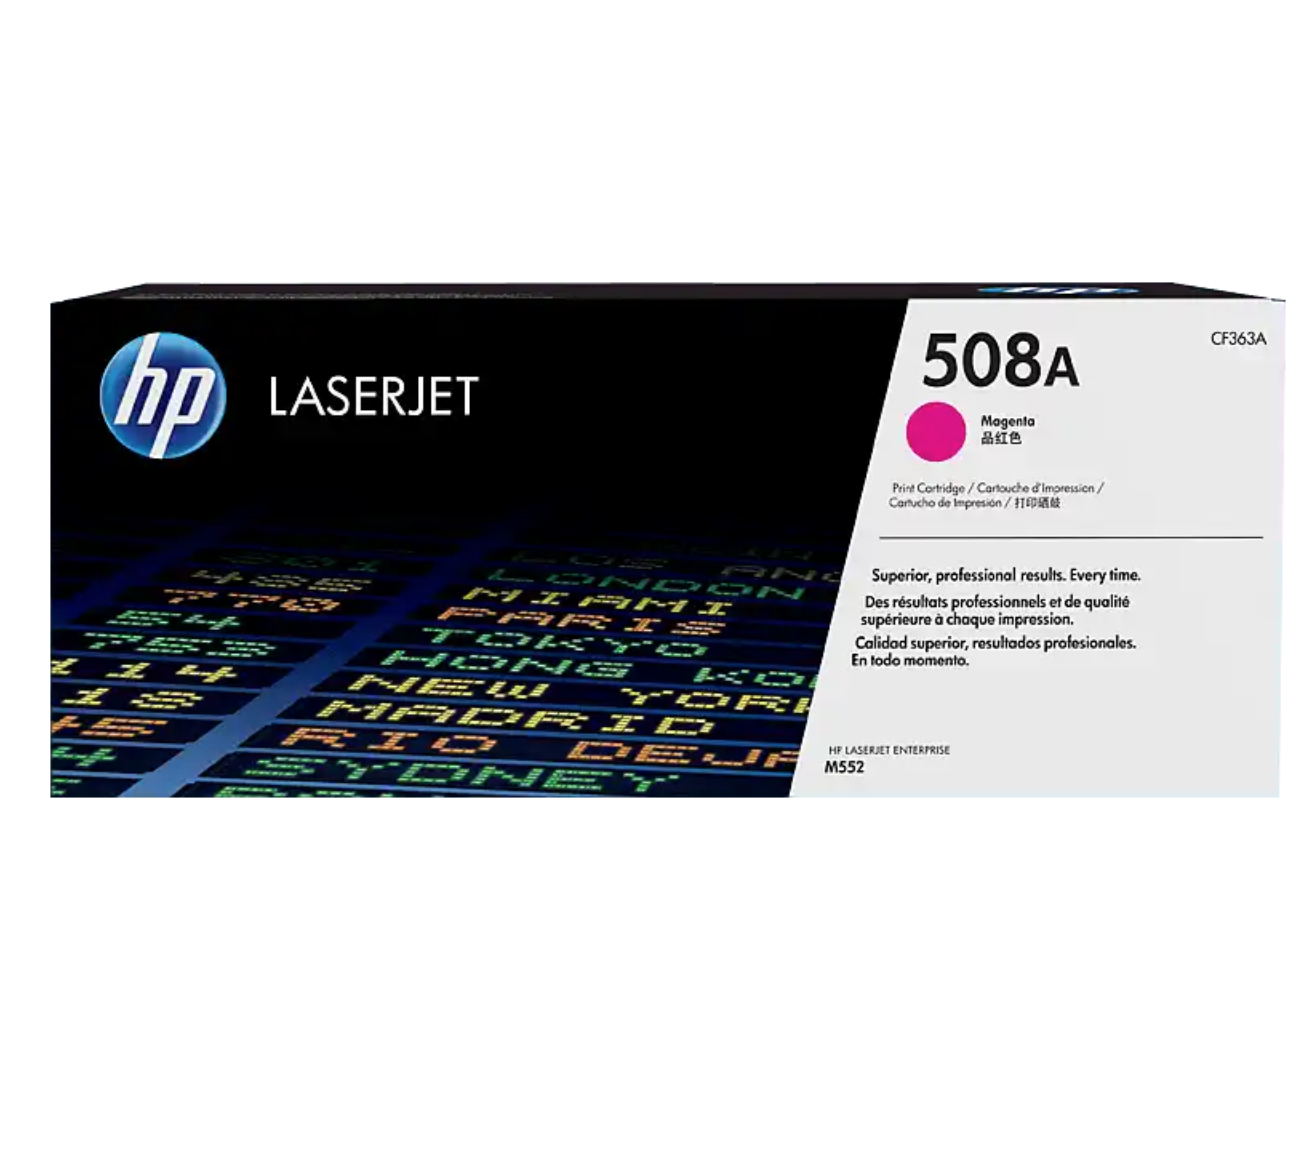 HP 508A 洋紅原廠 LaserJet 碳粉 CF363A